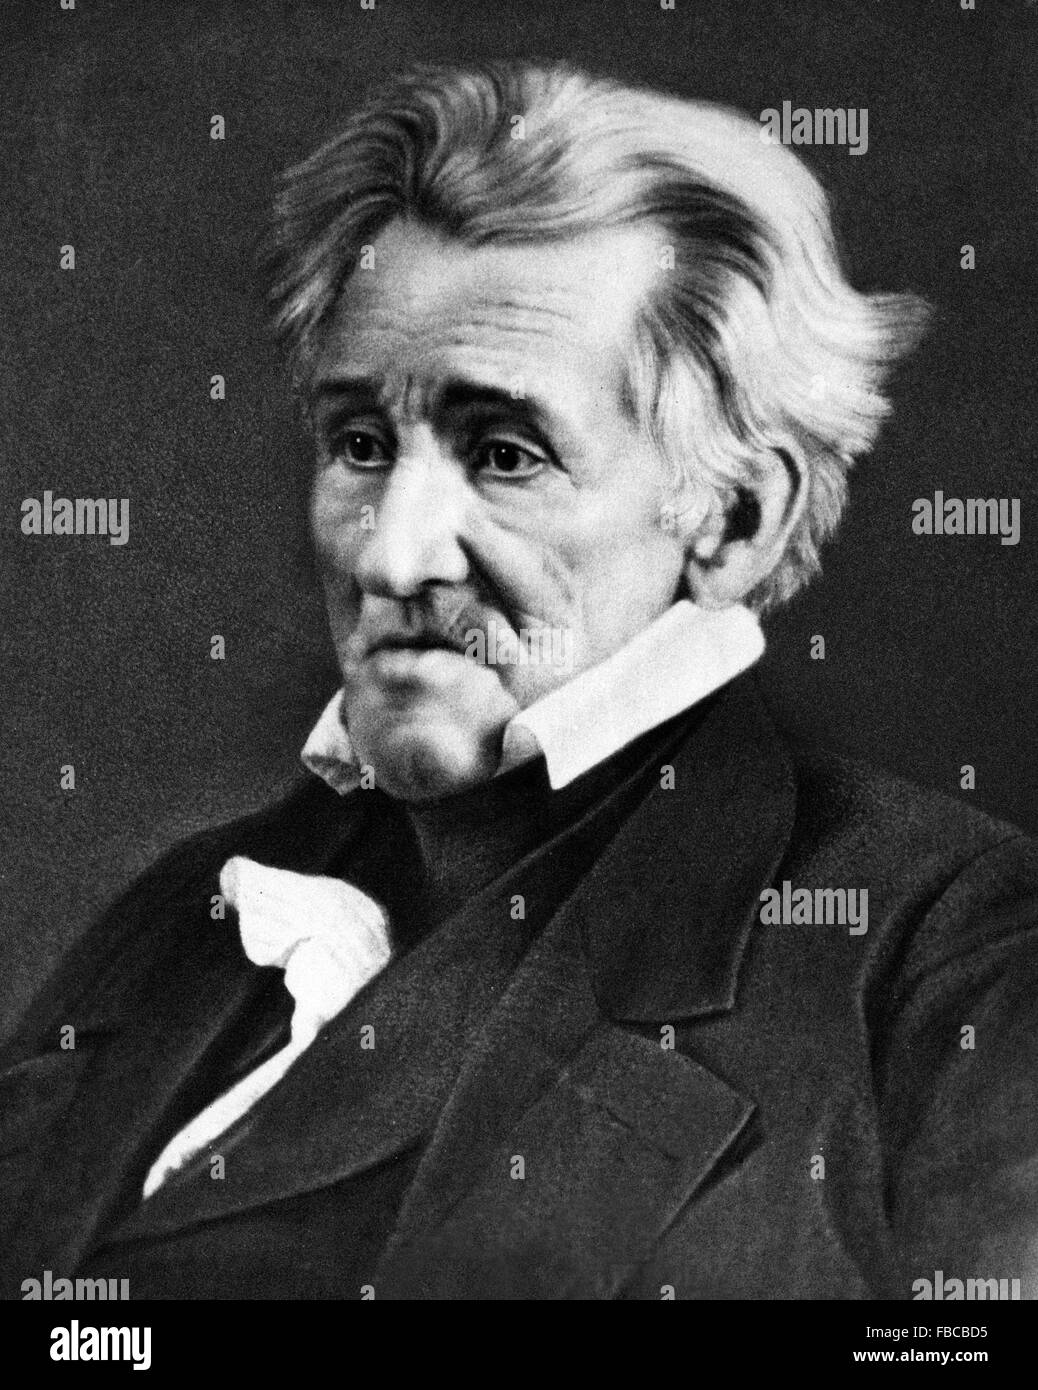 Andrew Jackson. Daguerrotype of the 7th US President, 1845 - Stock Image